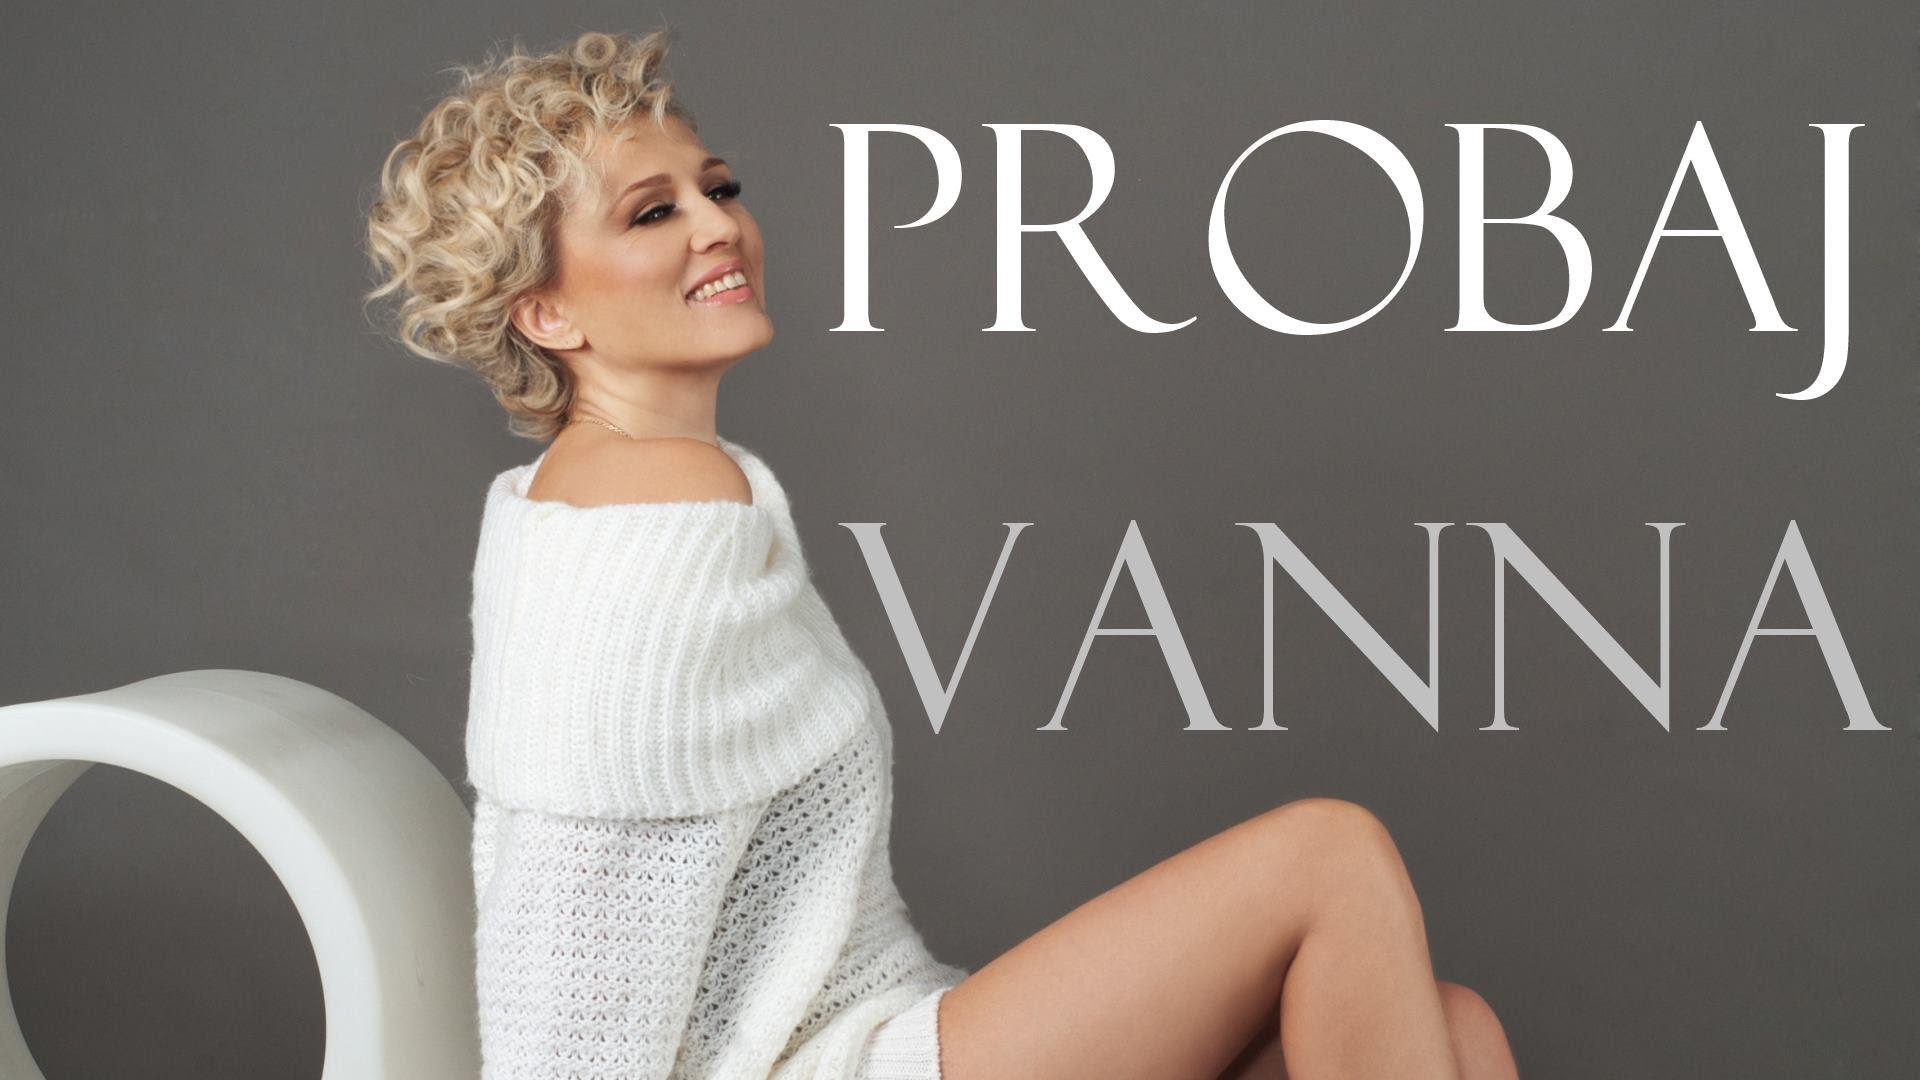 VANNA - 2015 - Probaj